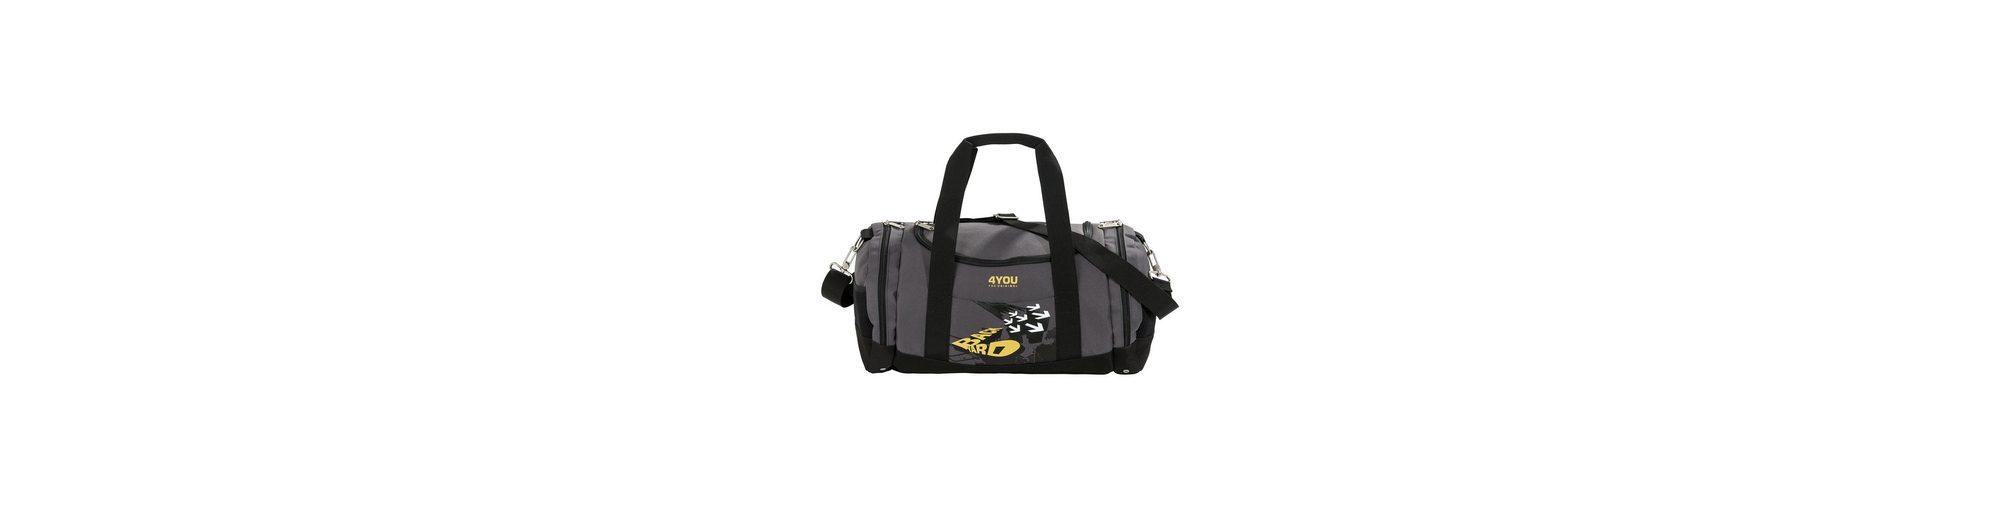 Sporttasche Backyard, »Sportbag Function«, 4YOU